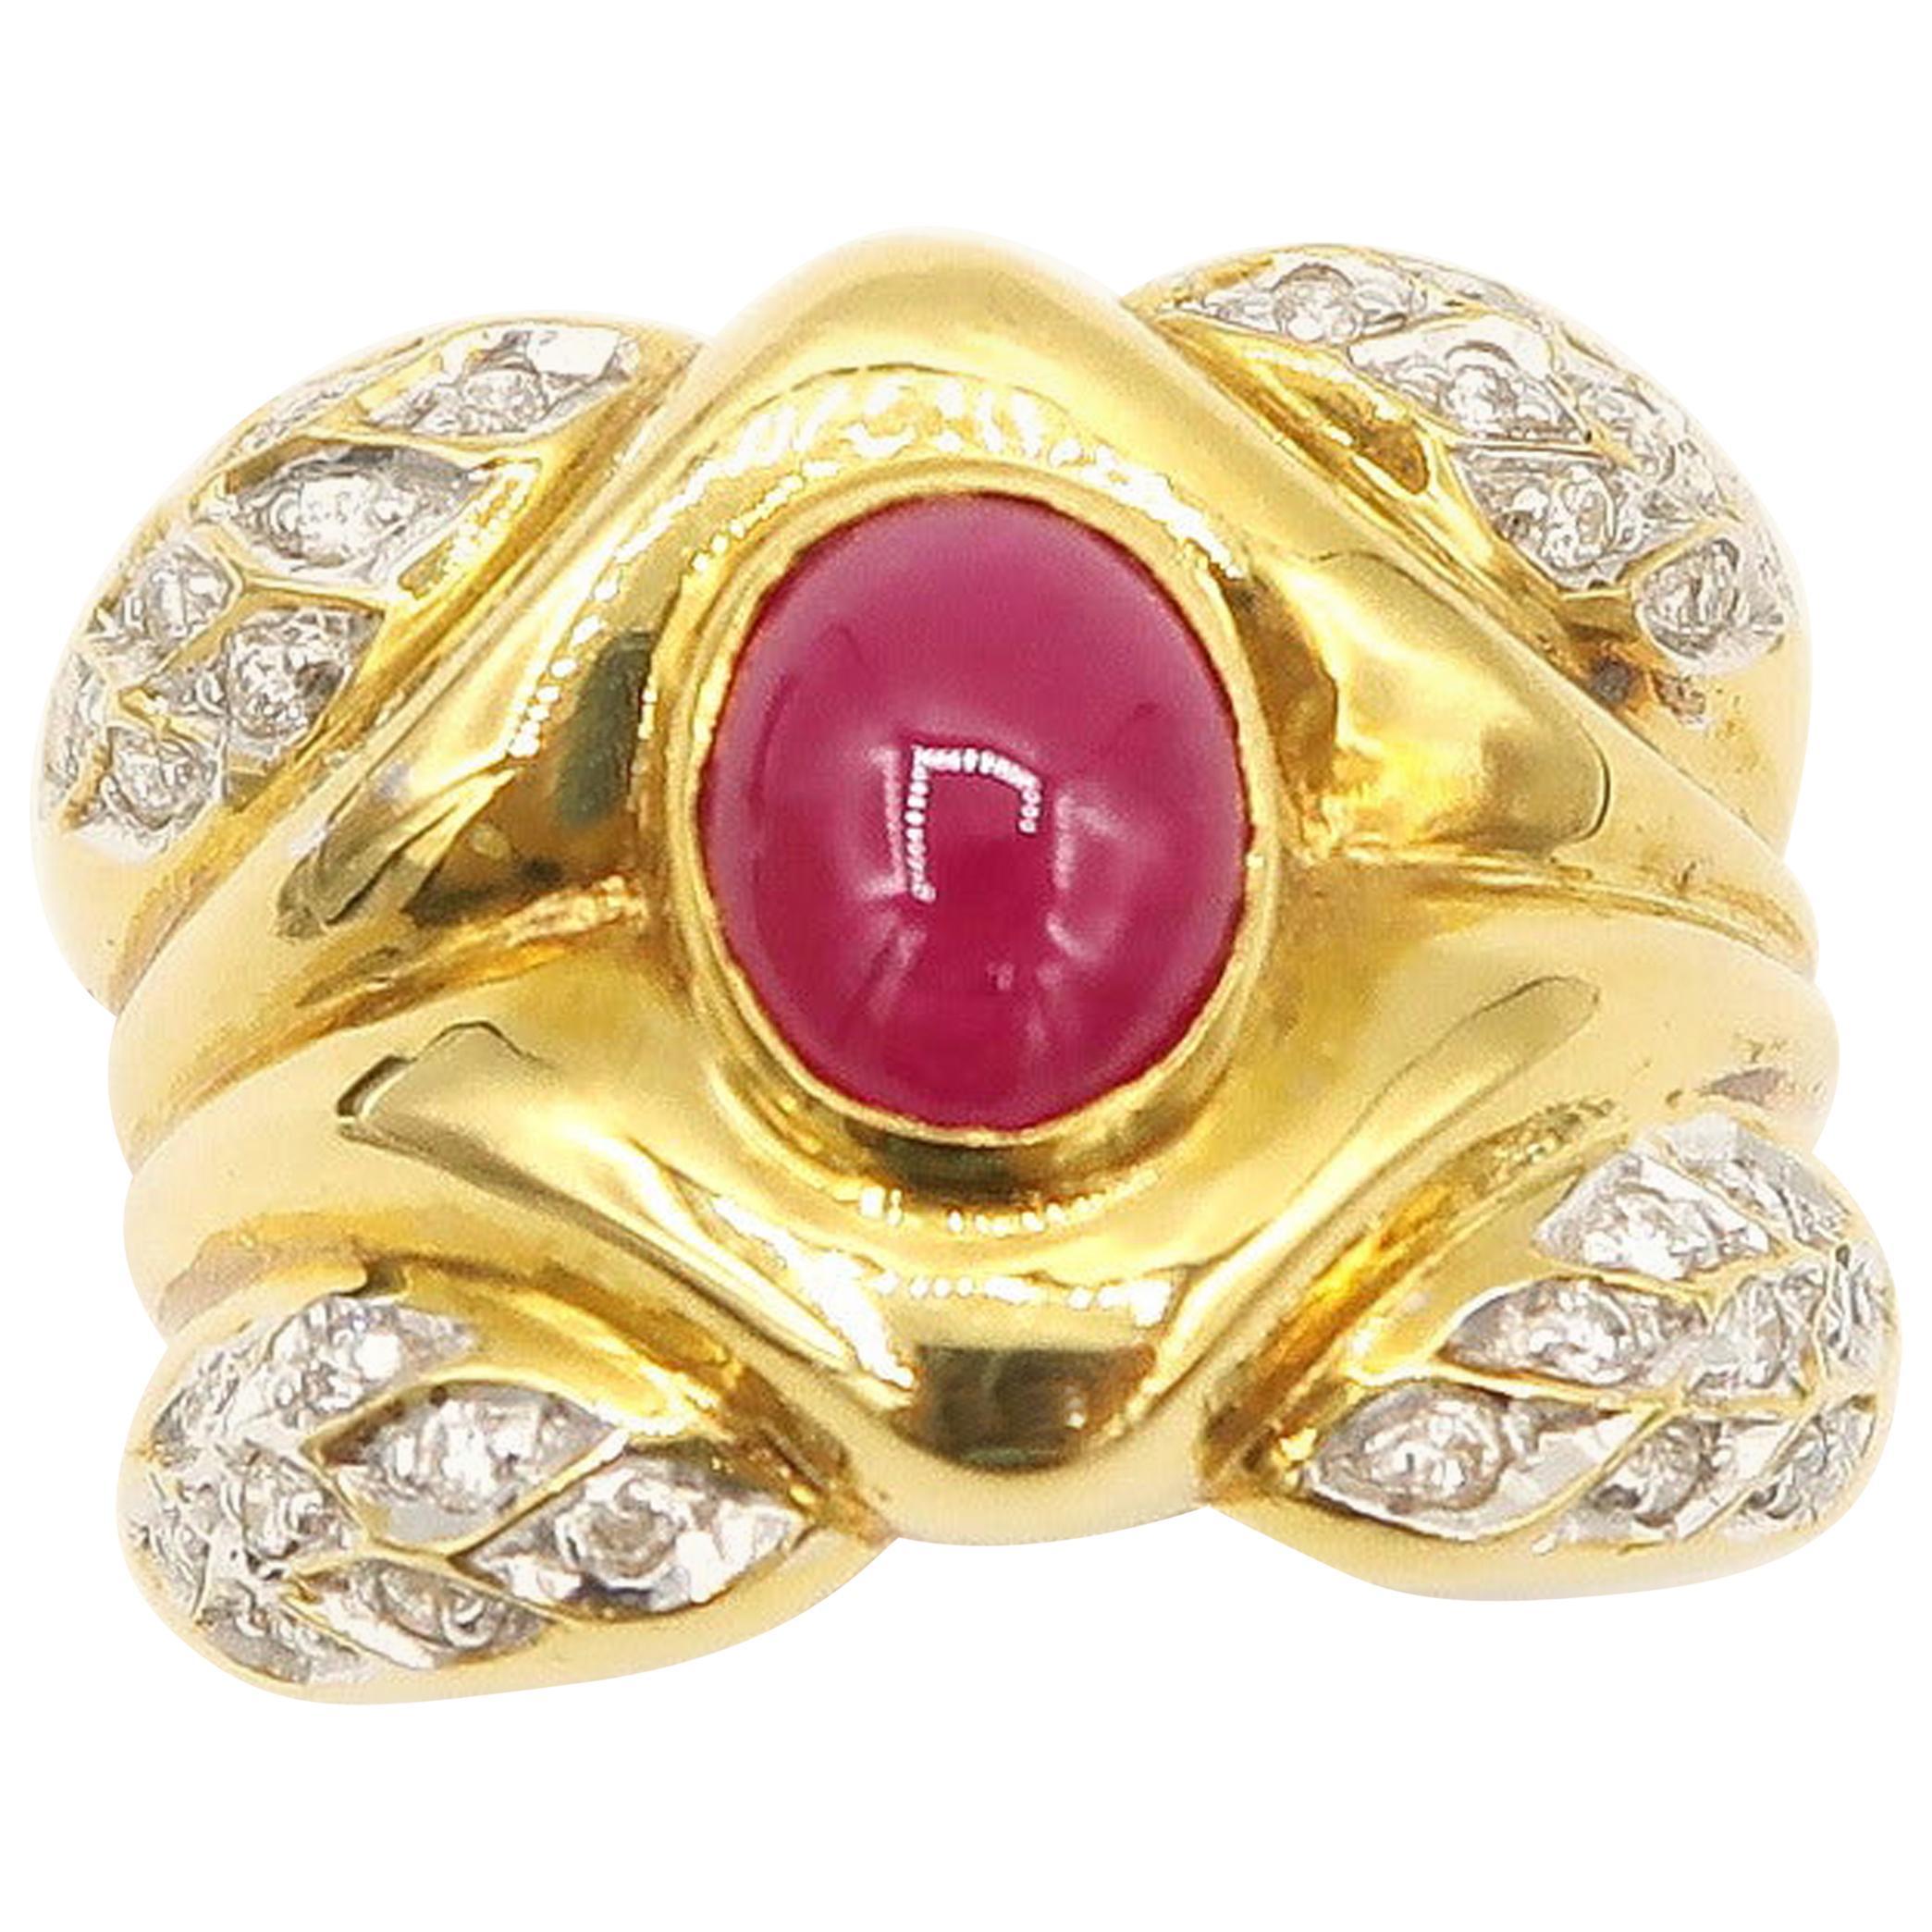 Cabochon Ruby with Diamond 18 Karat Gold Men's Ring